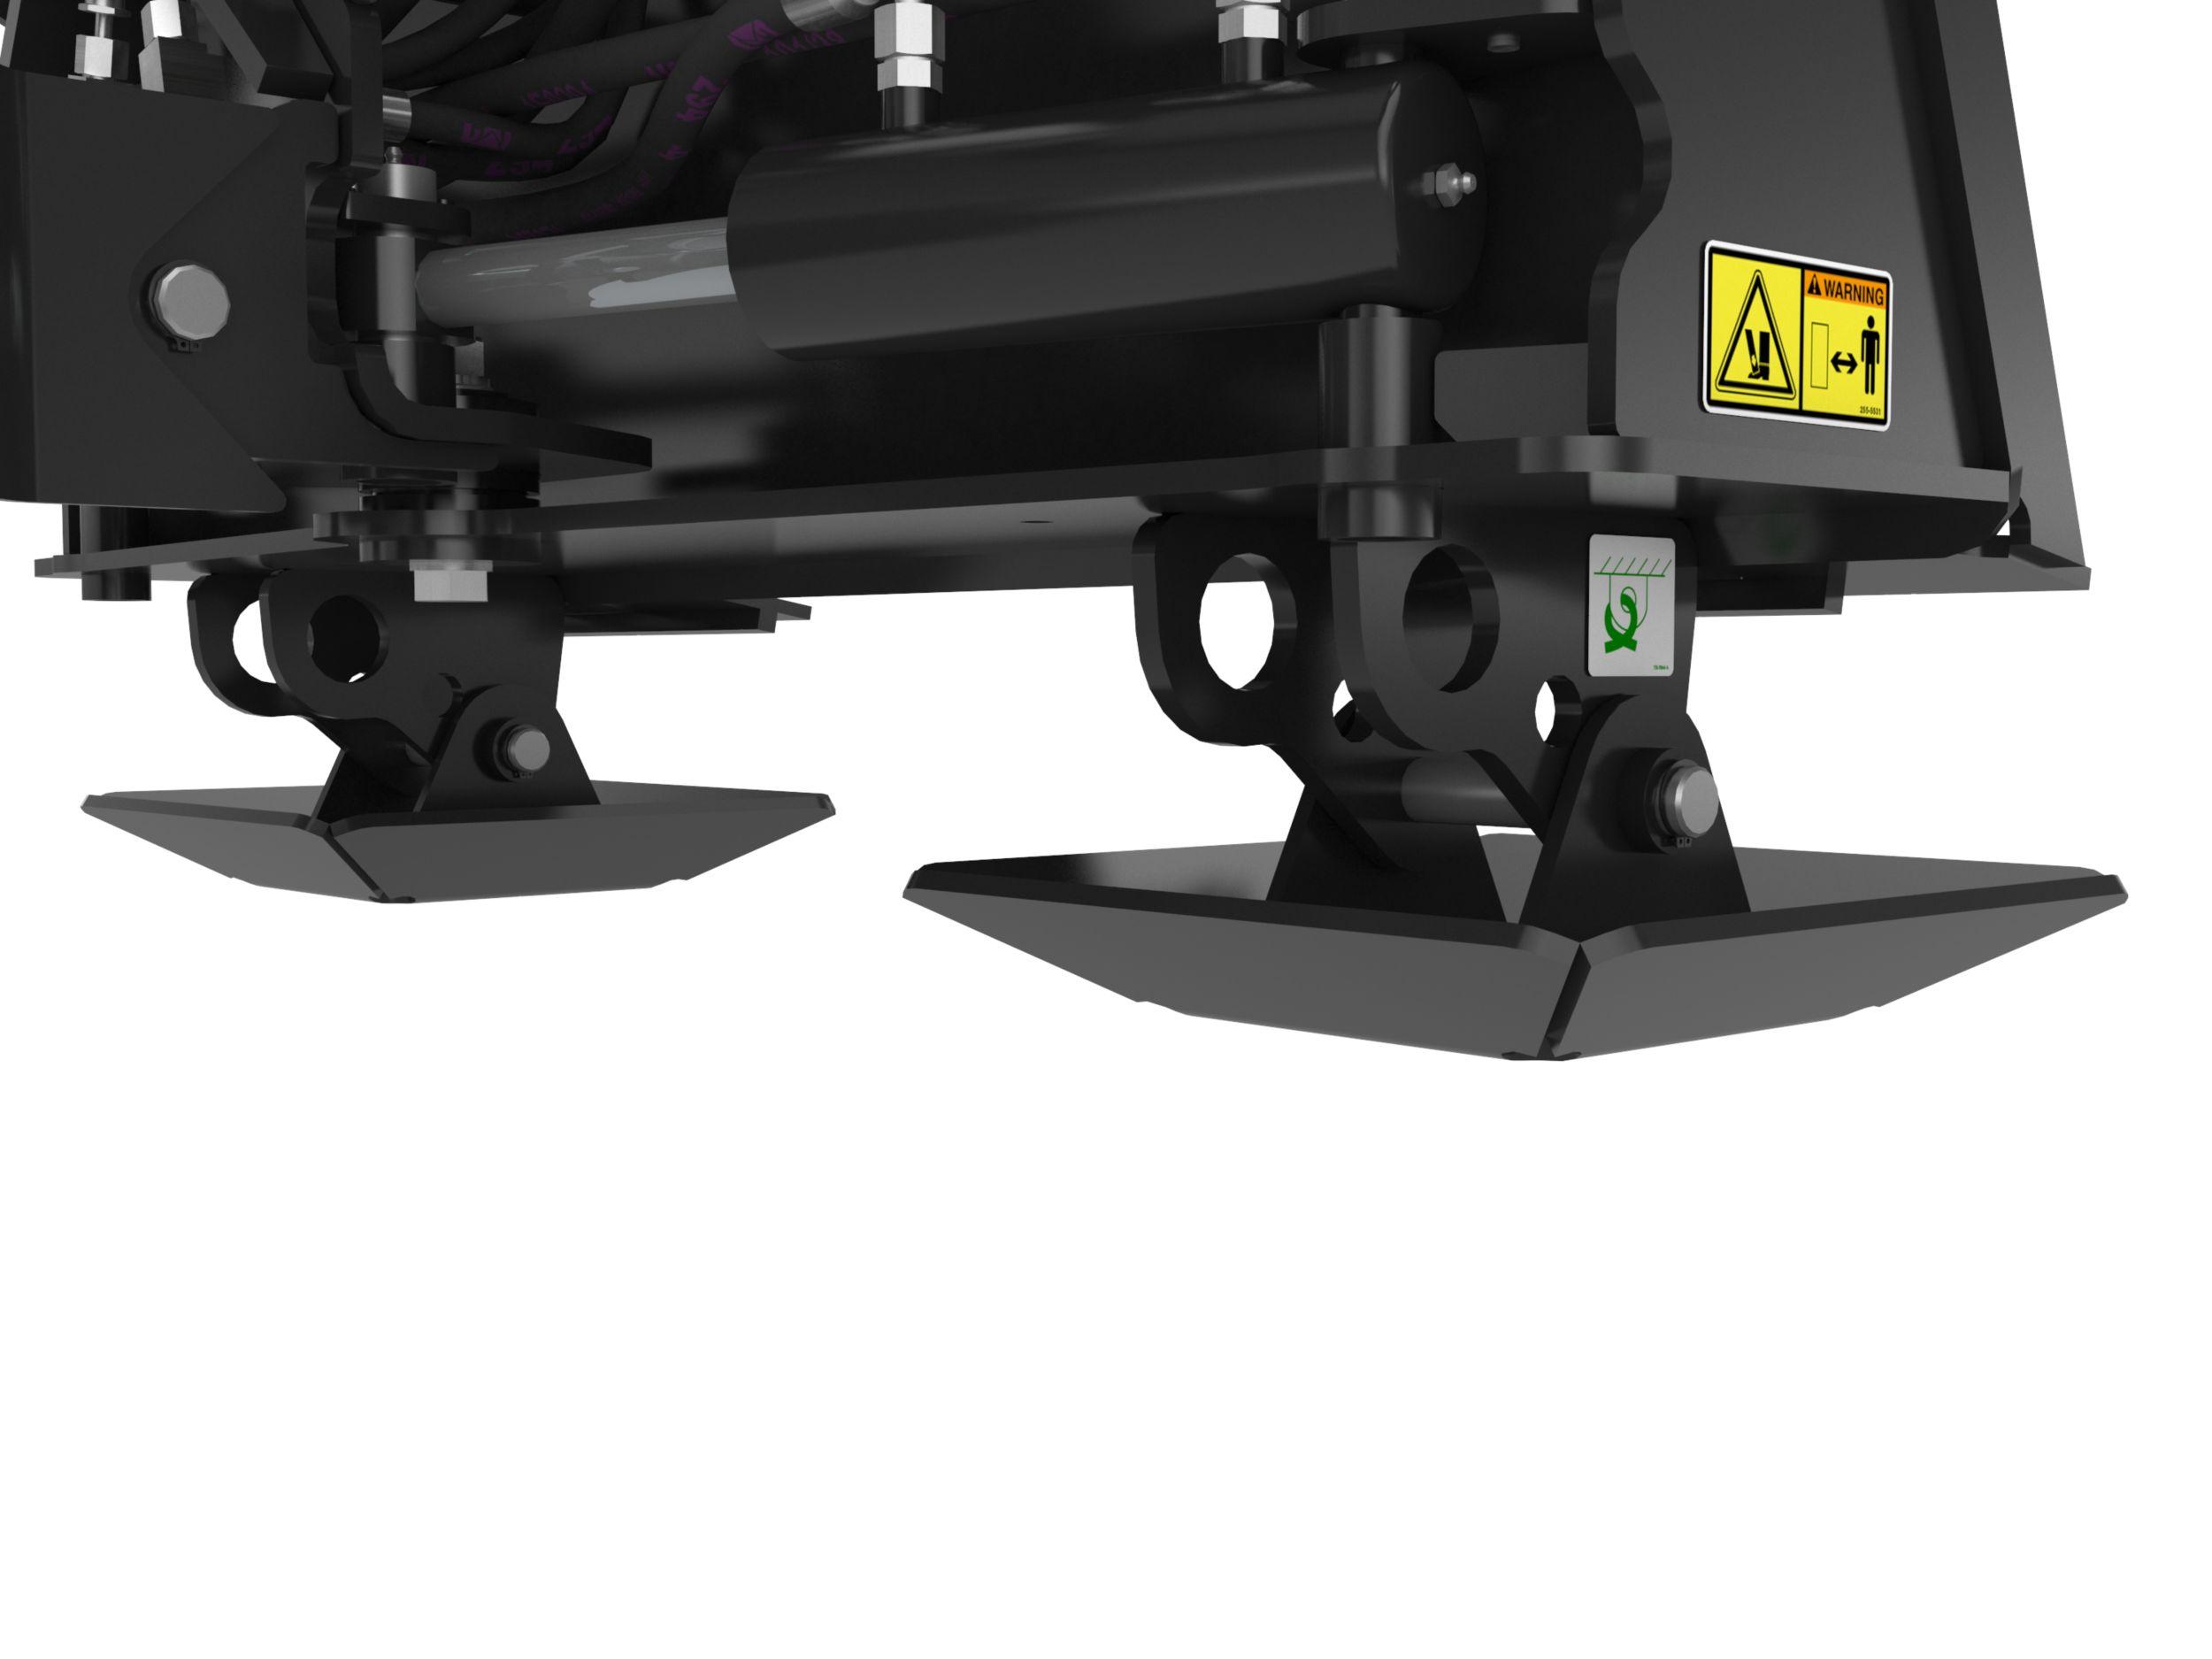 Cat Sg18b Stump Grinder Caterpillar 236 Engine Diagram Dual Height Pivoting Stand Feet